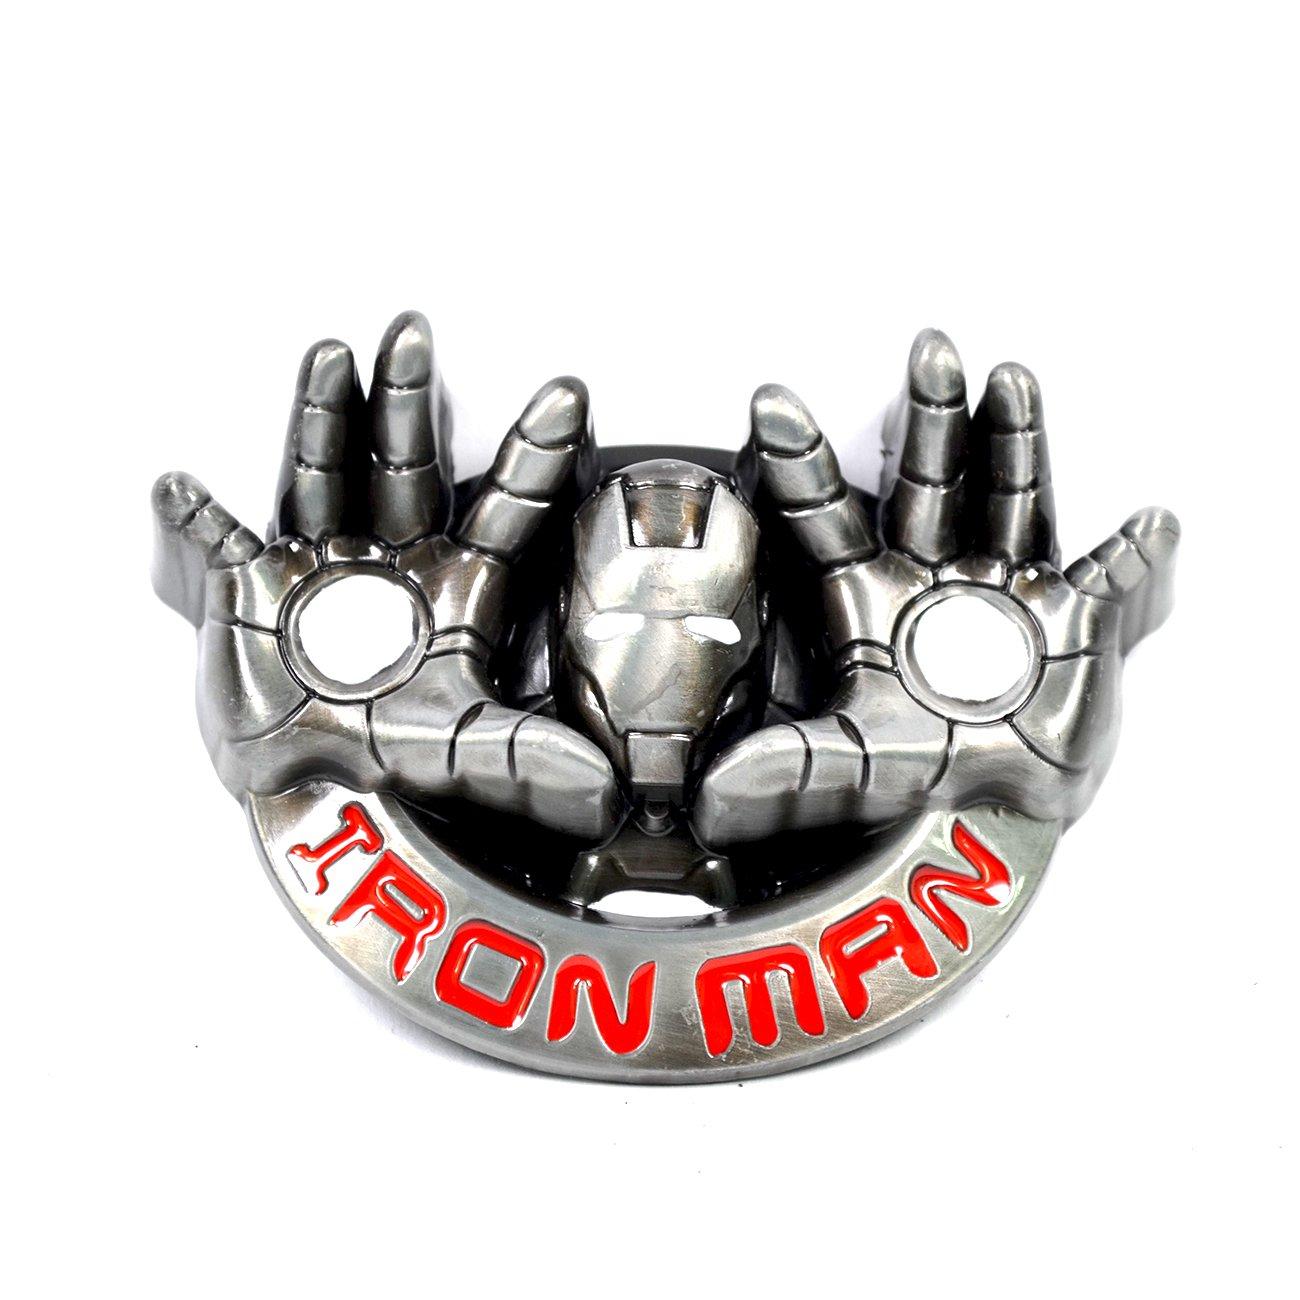 Motorrad Lenker 360 Grad drehbar Rollstuhl Rutschfest Kinderwagen AOLVO Universal-Getr/änkehalter f/ür Fahrrad Getr/änkehalter f/ür Baby-Kinderwagen f/ür Trinkflasche MTB Road /& Mountain Fahrrad